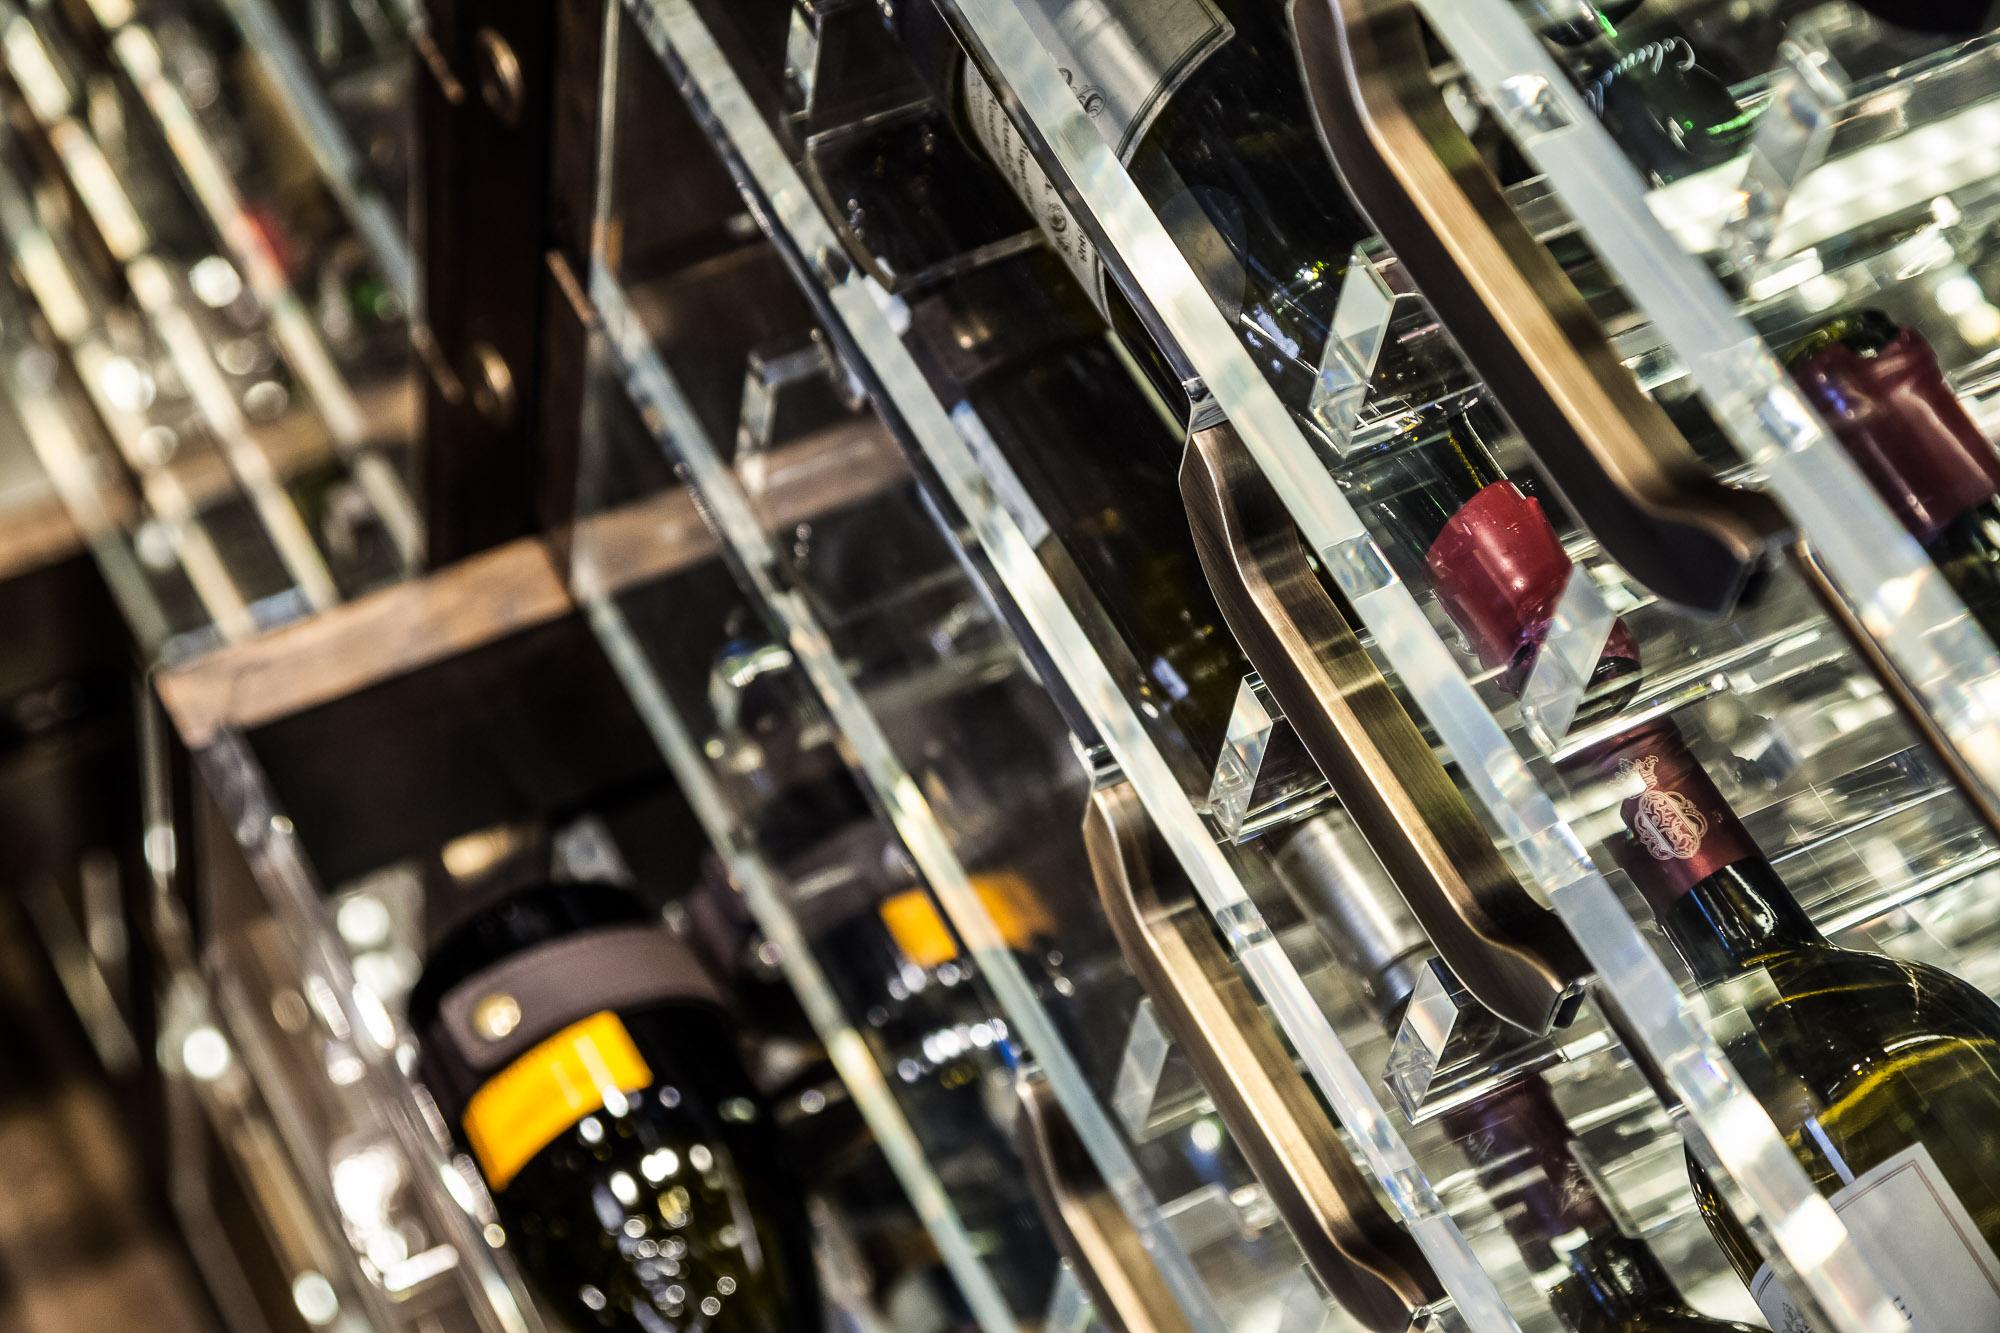 20170313_yacht_wine_cellar_0141.jpg